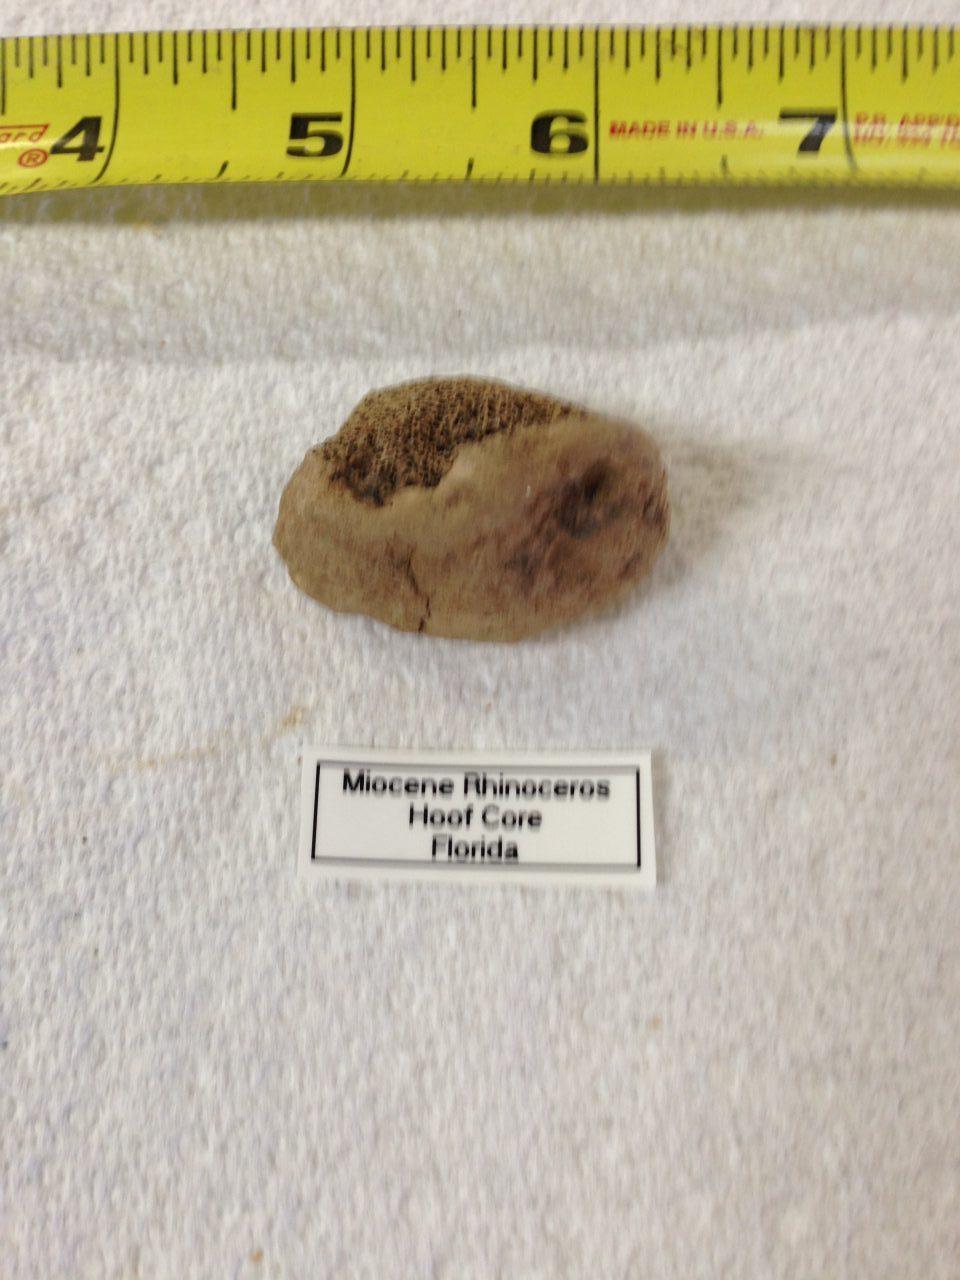 Rhinoceros Menoceras Barbouri Hoof Core Fossil | Fossils & Artifacts for Sale | Paleo Enterprises | Fossils & Artifacts for Sale